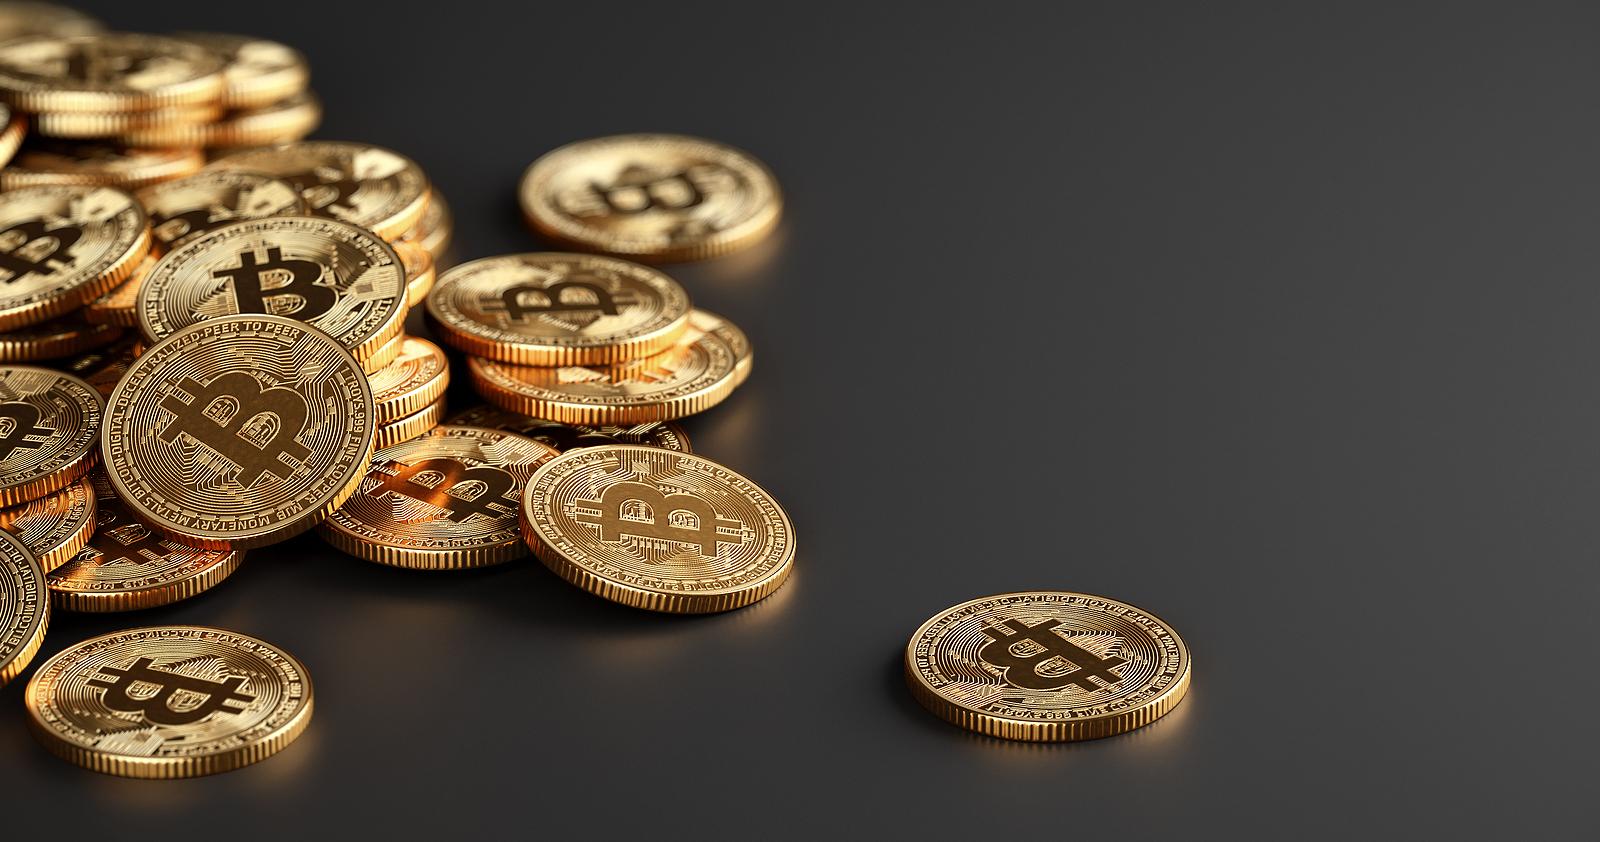 blockchain.com wallets recovery service